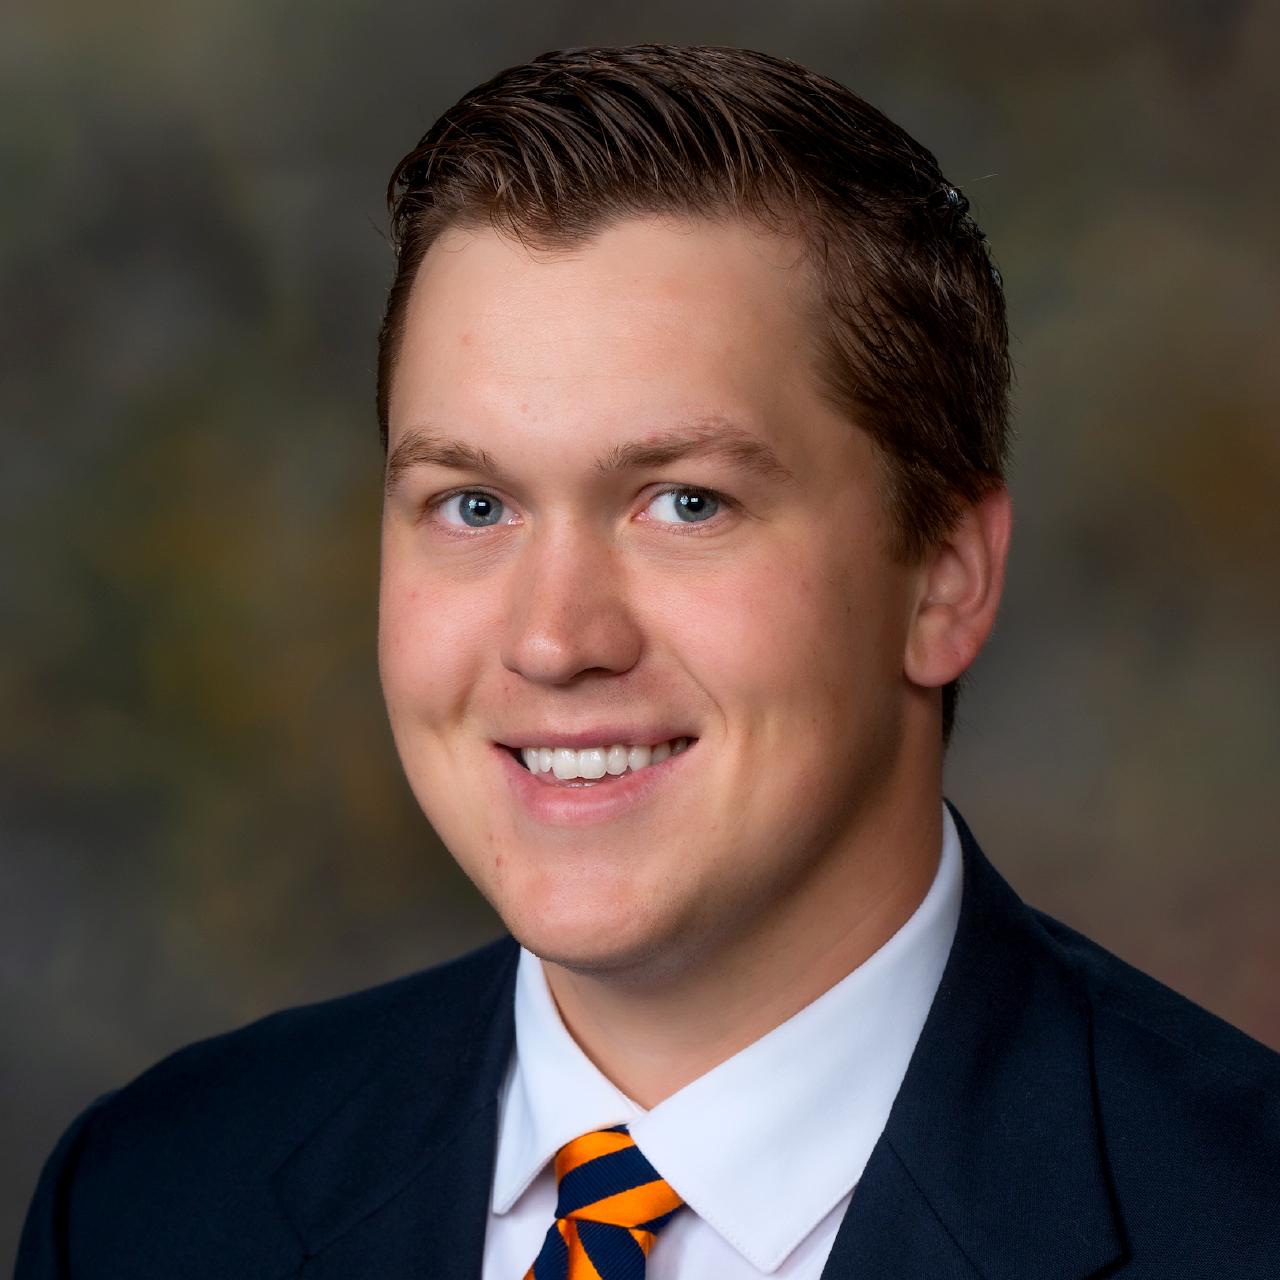 Photo of Jonah Biensch, ANSC, Auburn University, AL